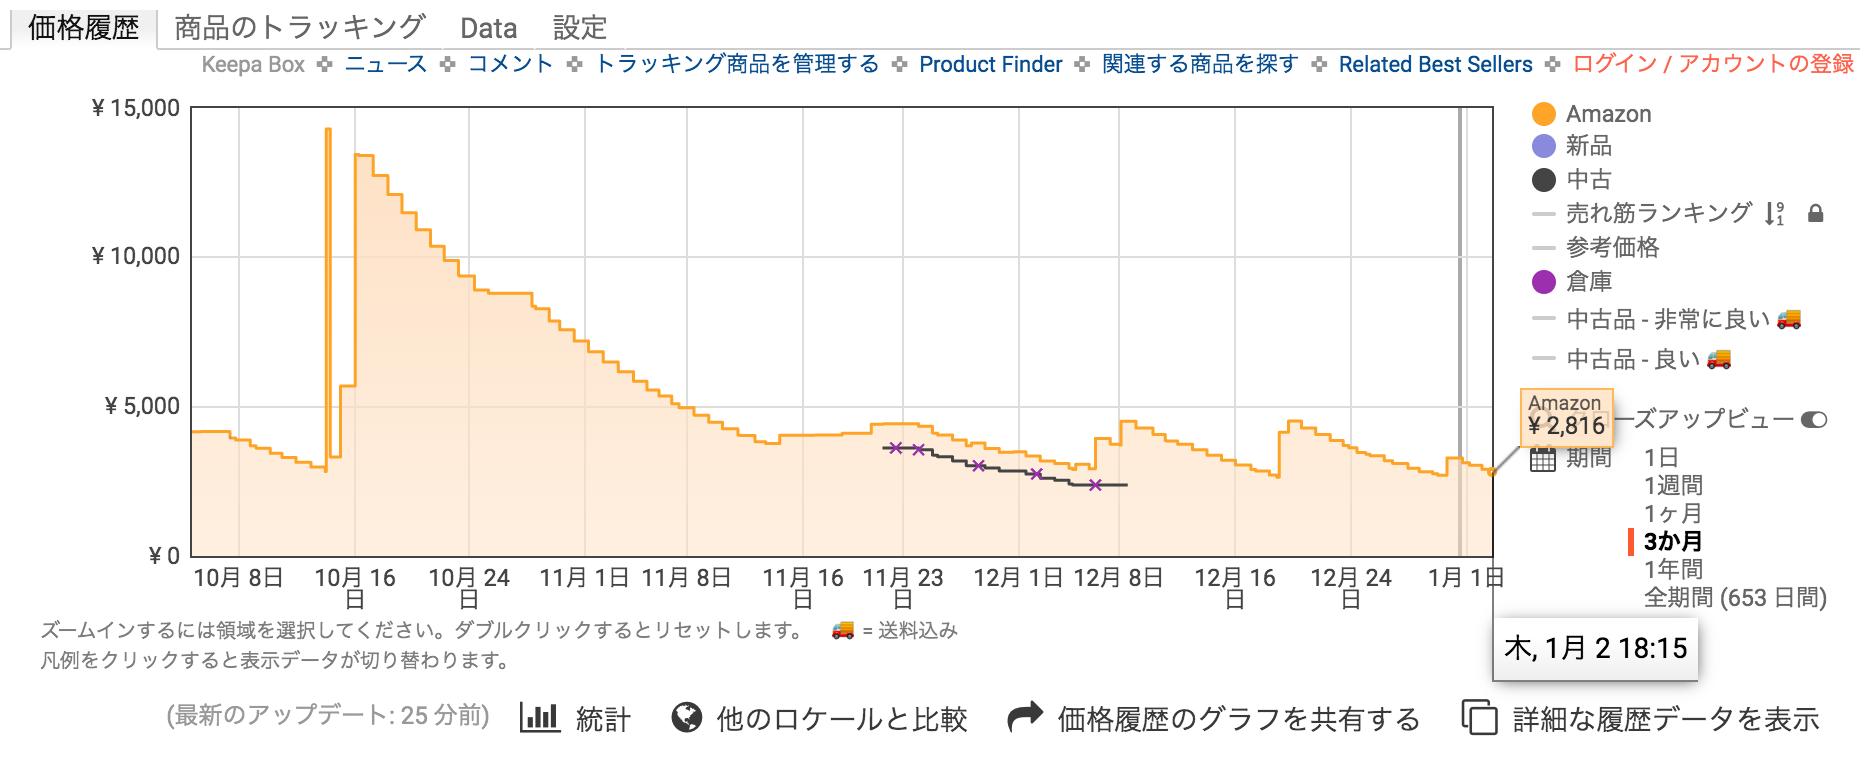 「Keepa」で表示されたとある商品の値段推移の画像